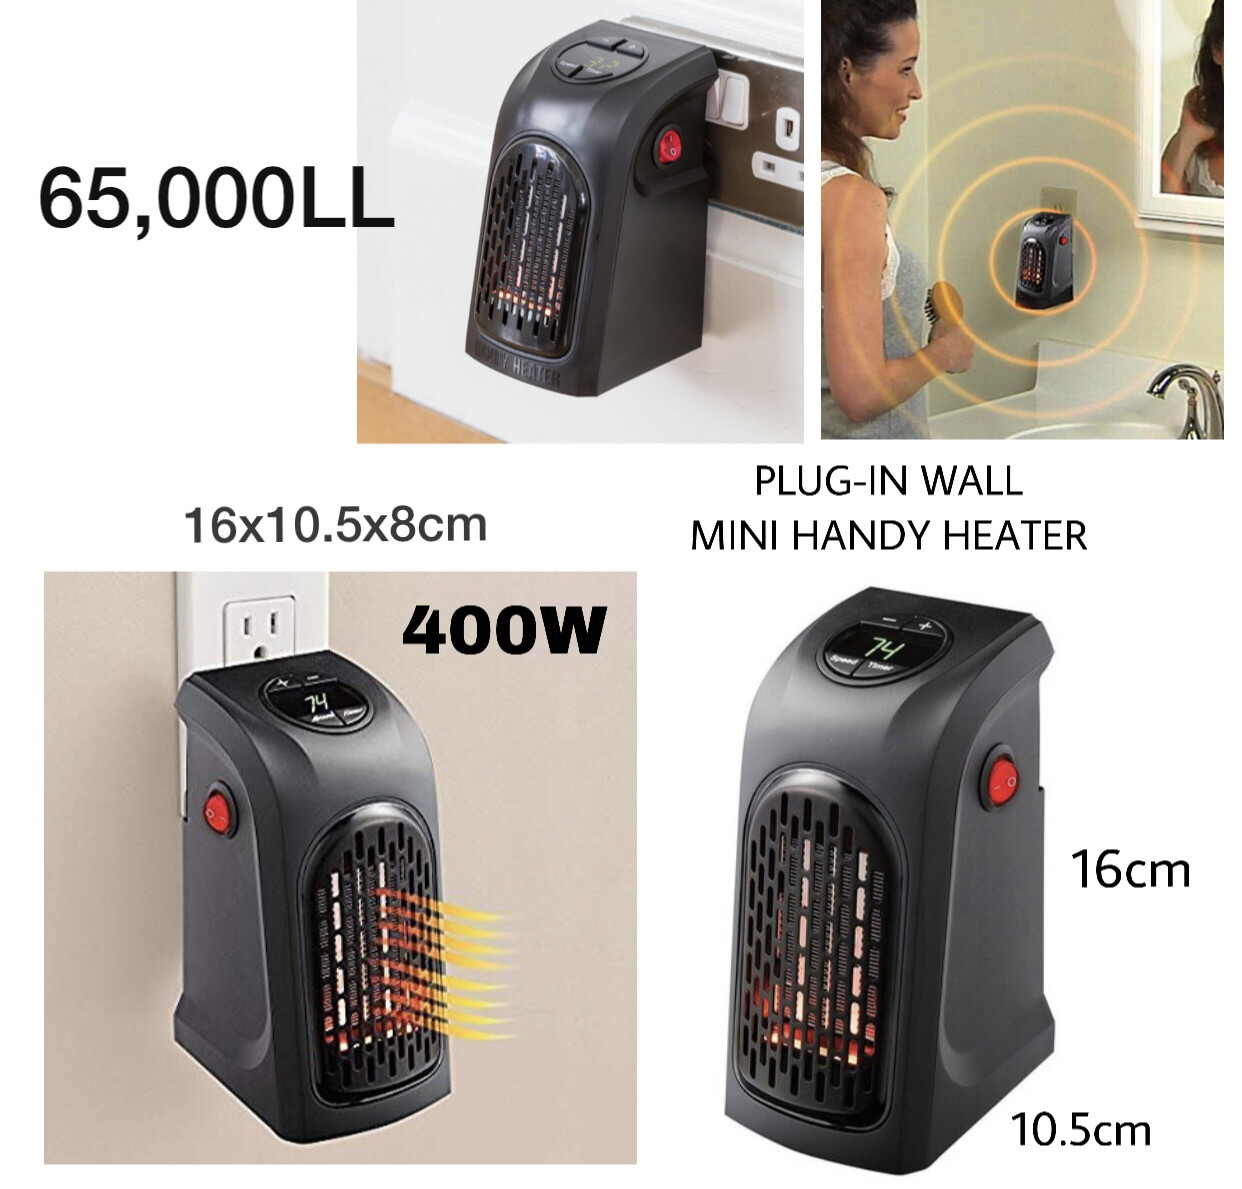 Mini Handy Heater